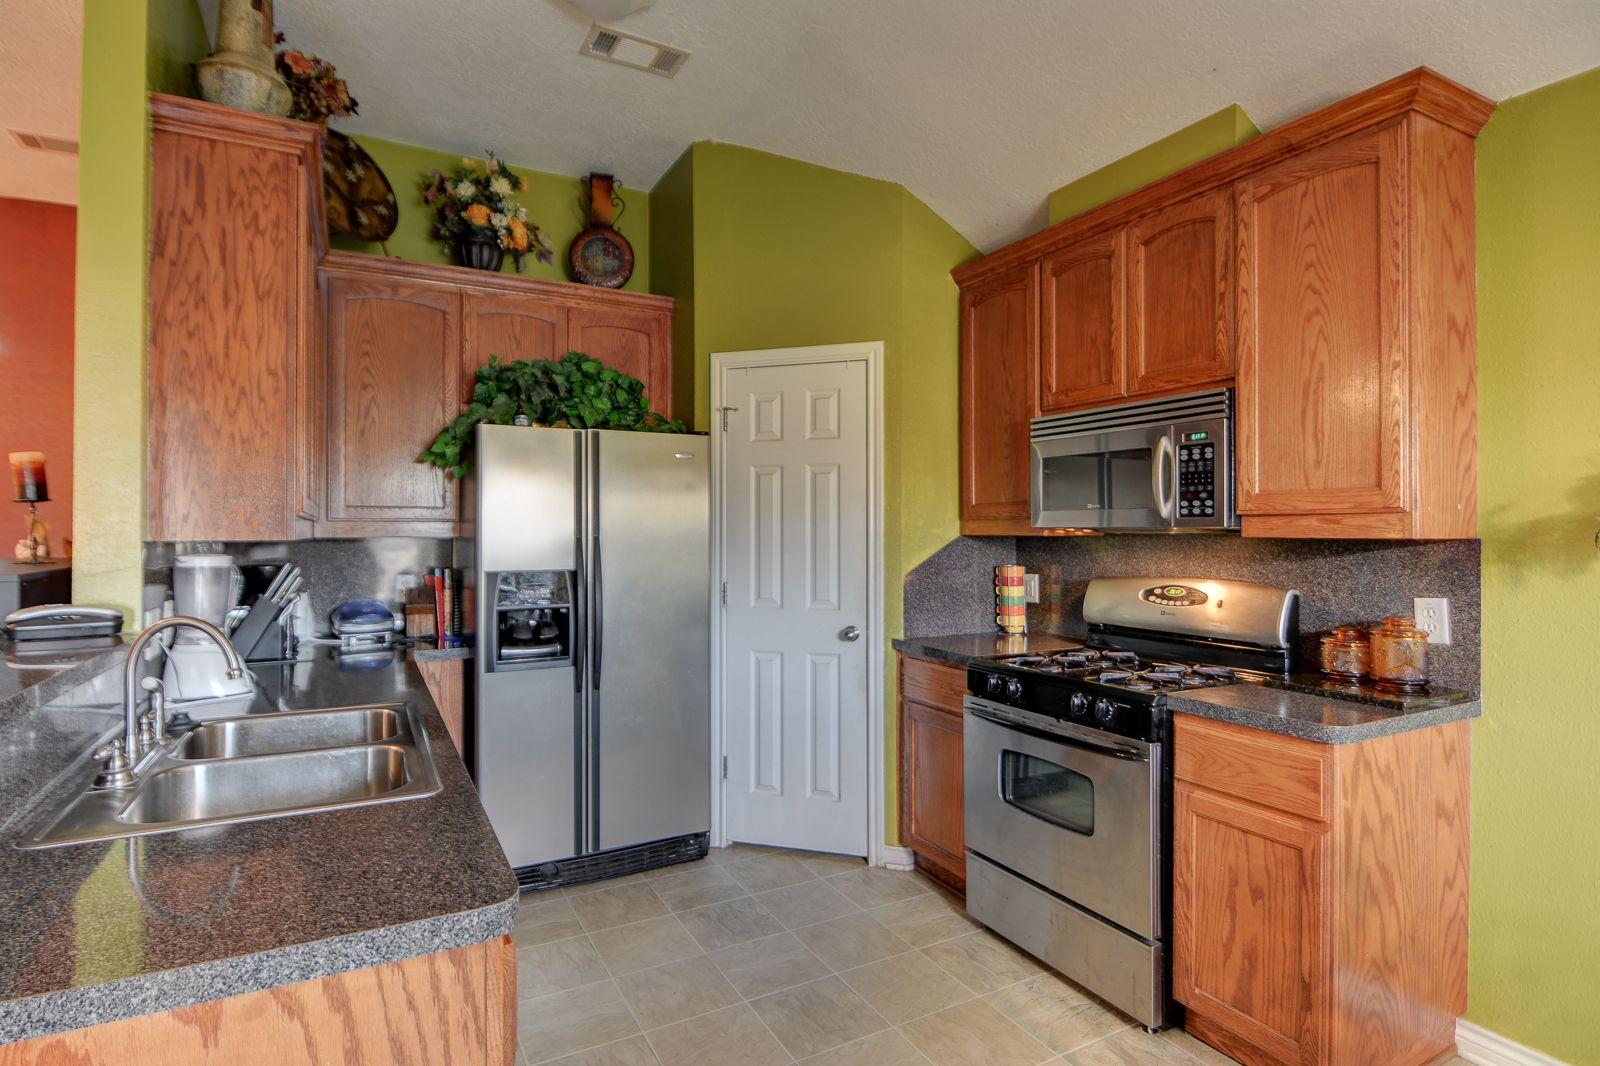 1208 ridgedale st bryan texas 77803 3 bedrooms 2 baths